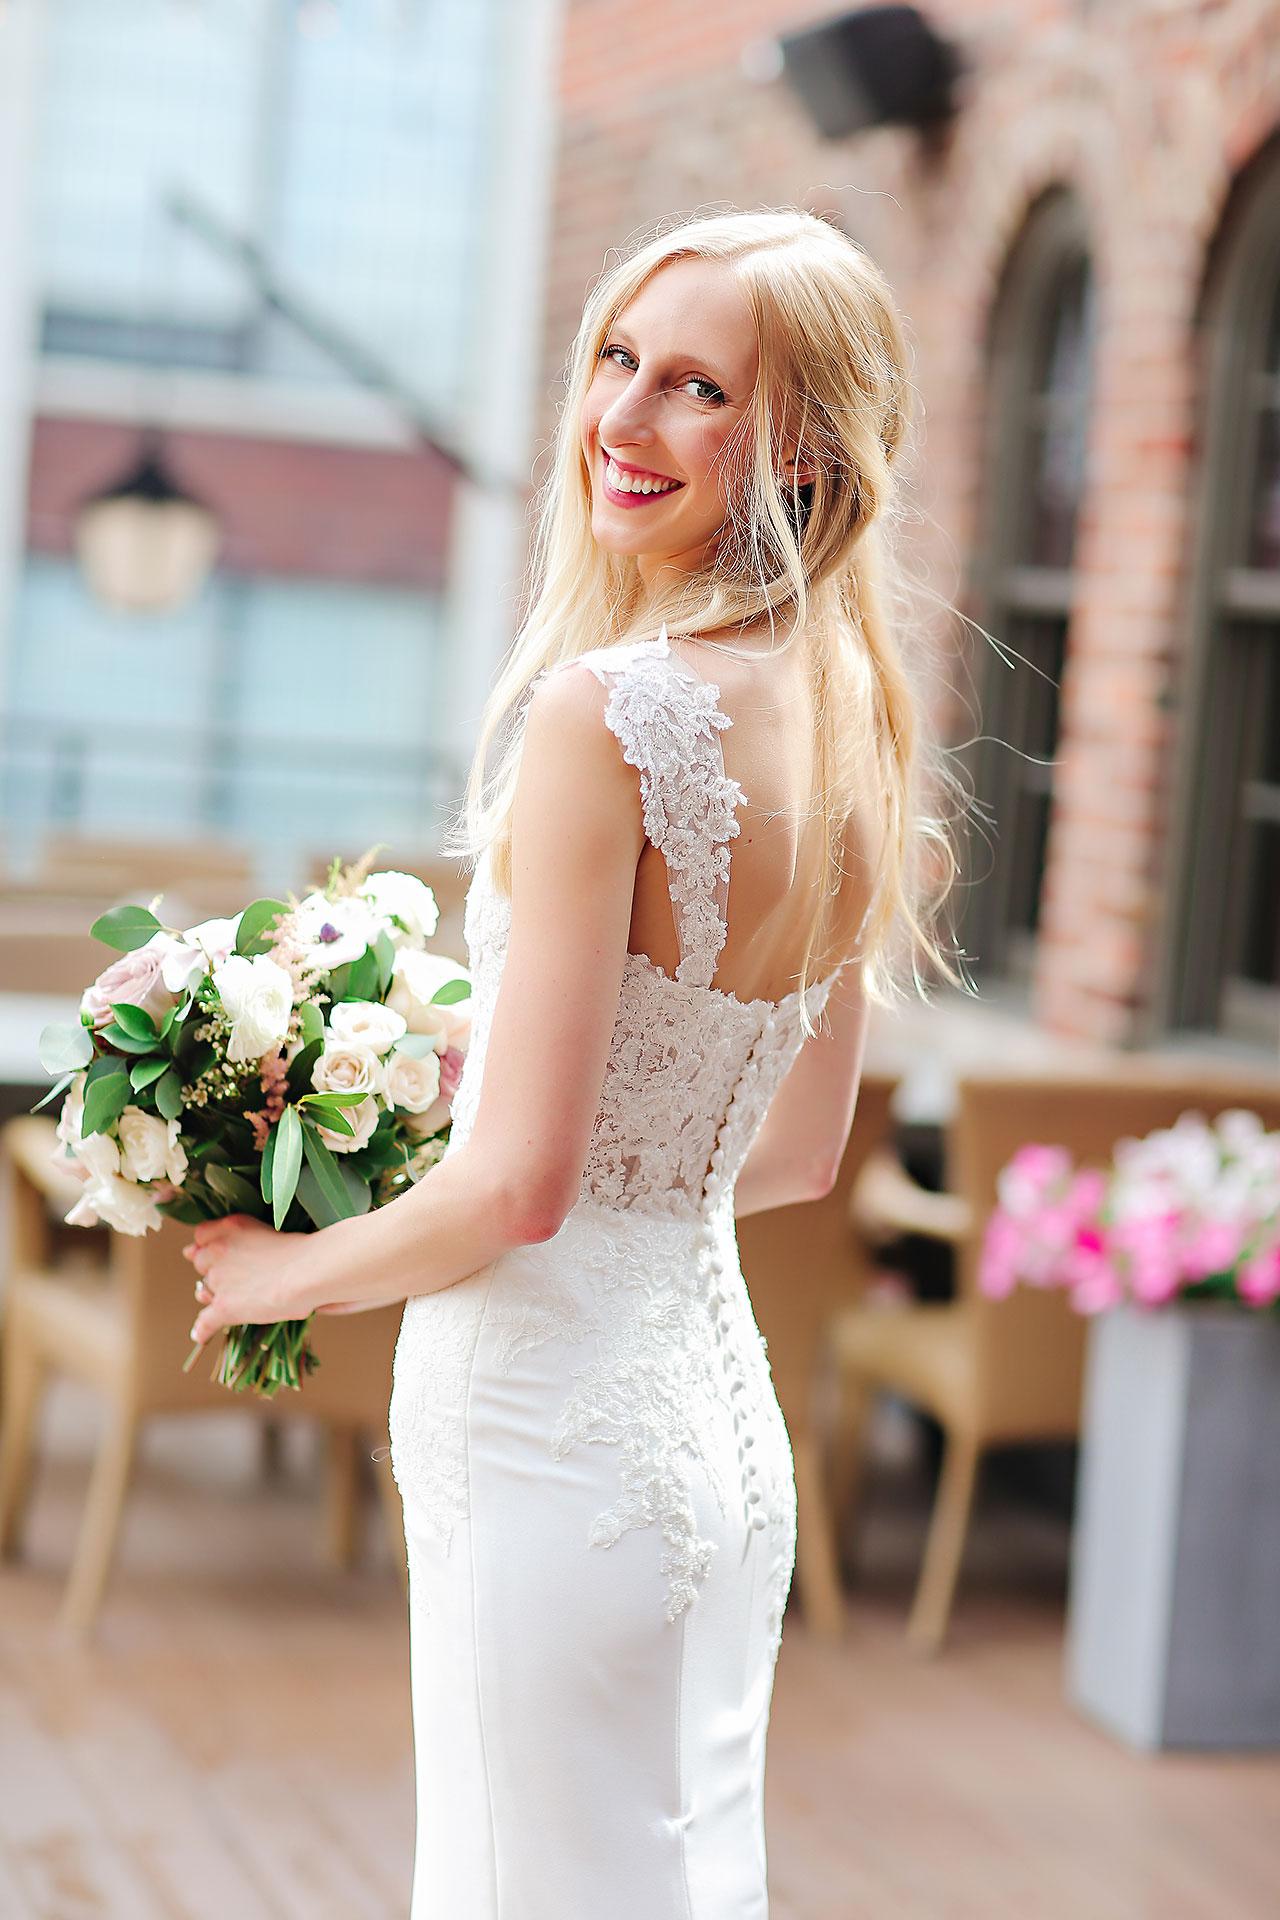 Molly Declan Scottish Rite Indianapolis Wedding 091